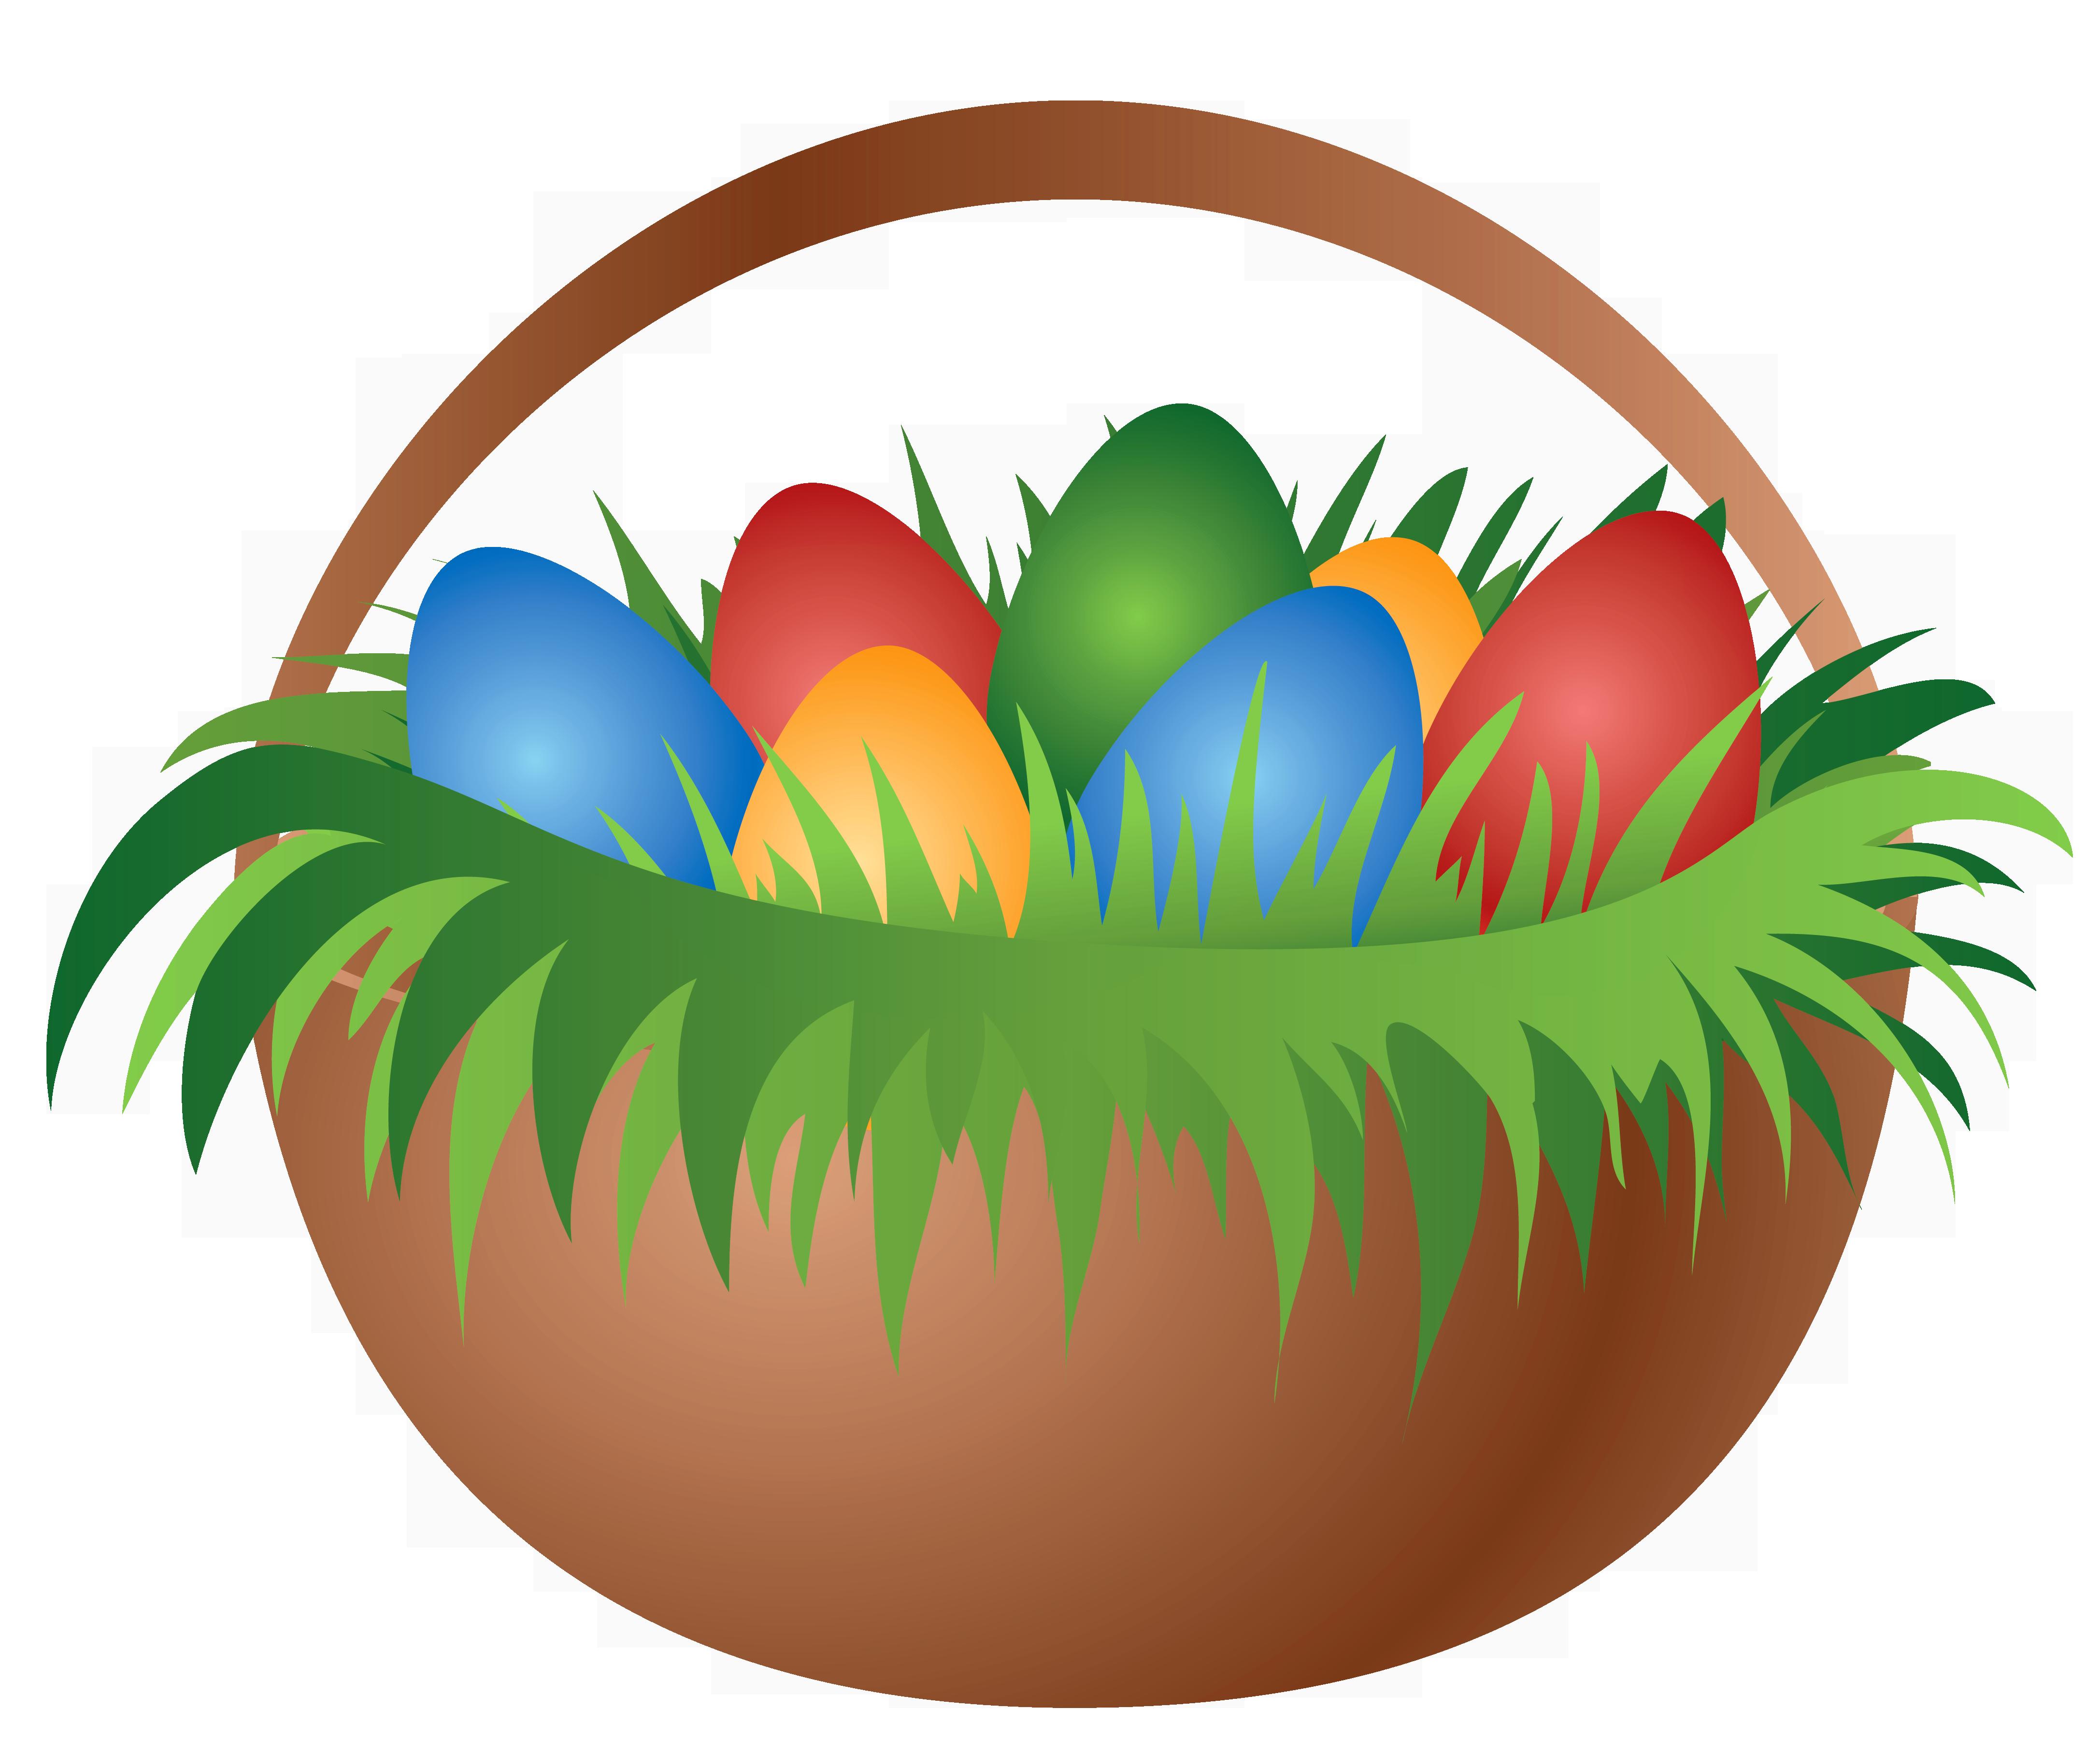 Free Easter Basket Pics Download